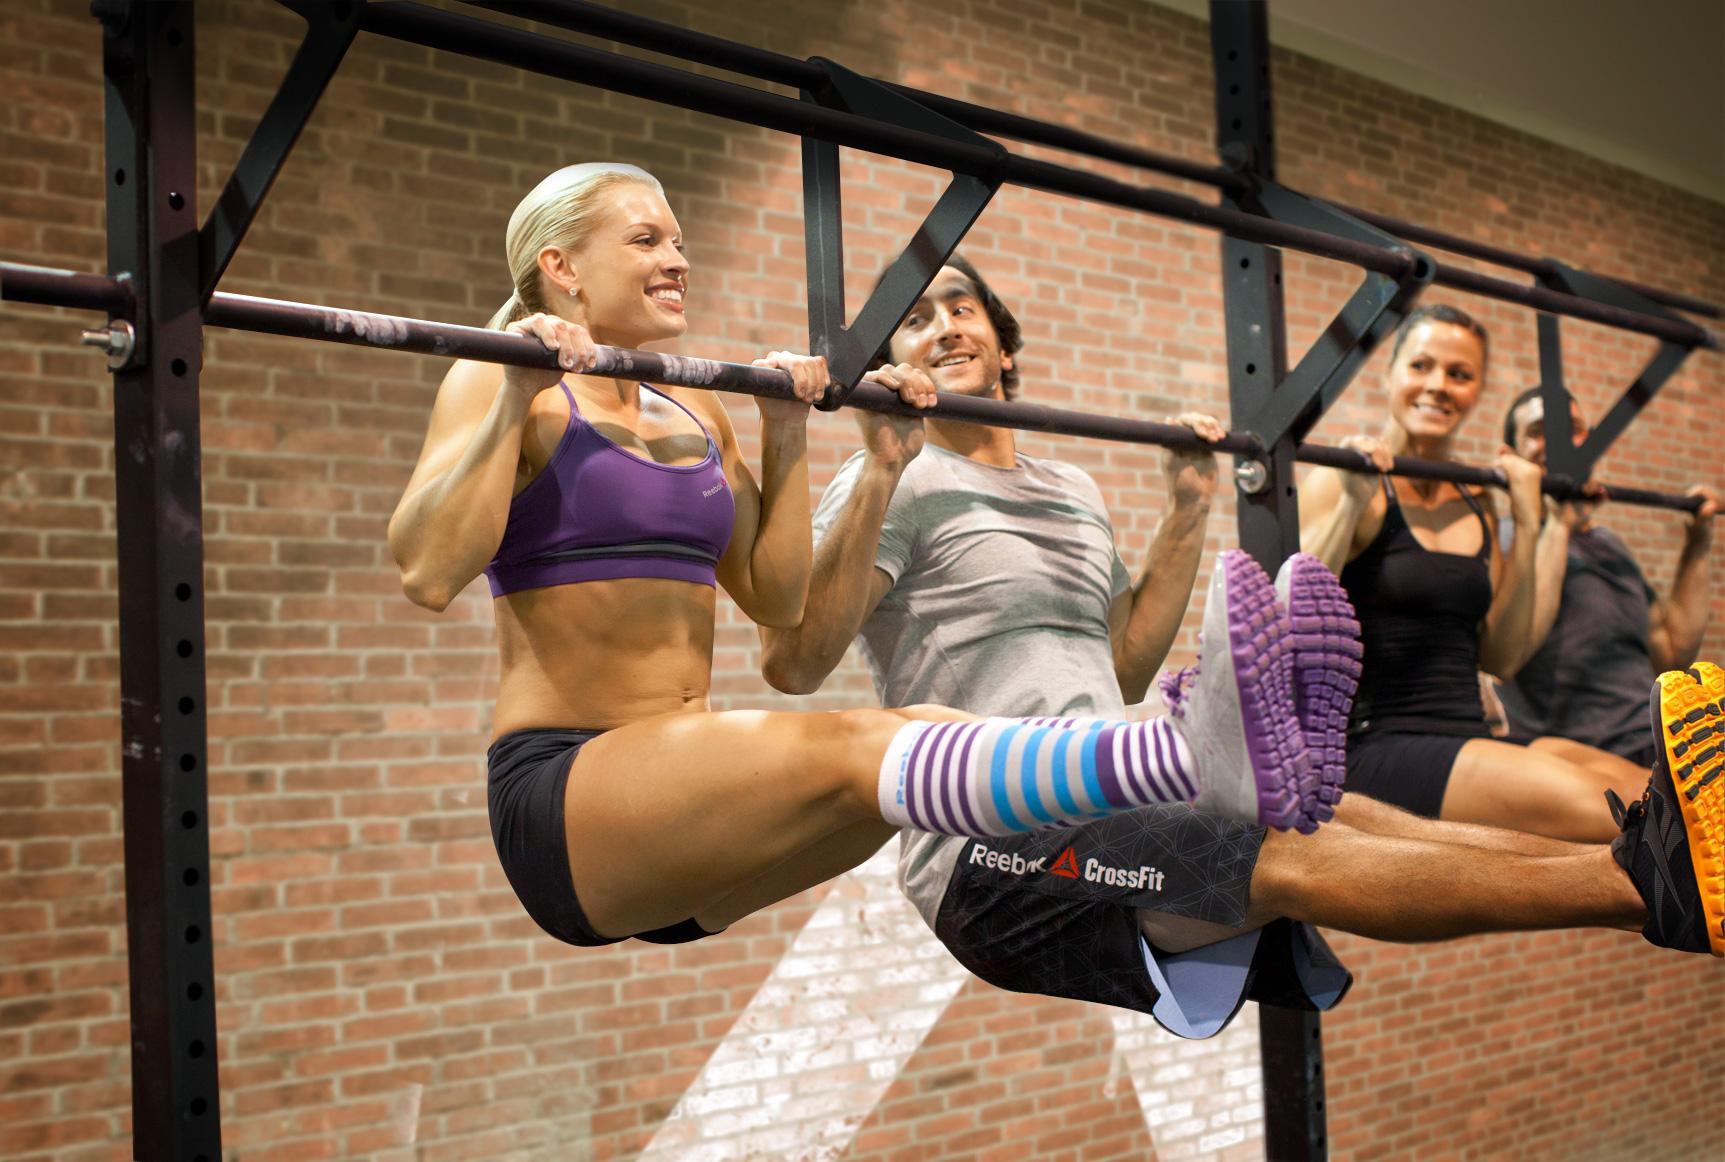 CrossFit-vantagens-e-desvantagens-01